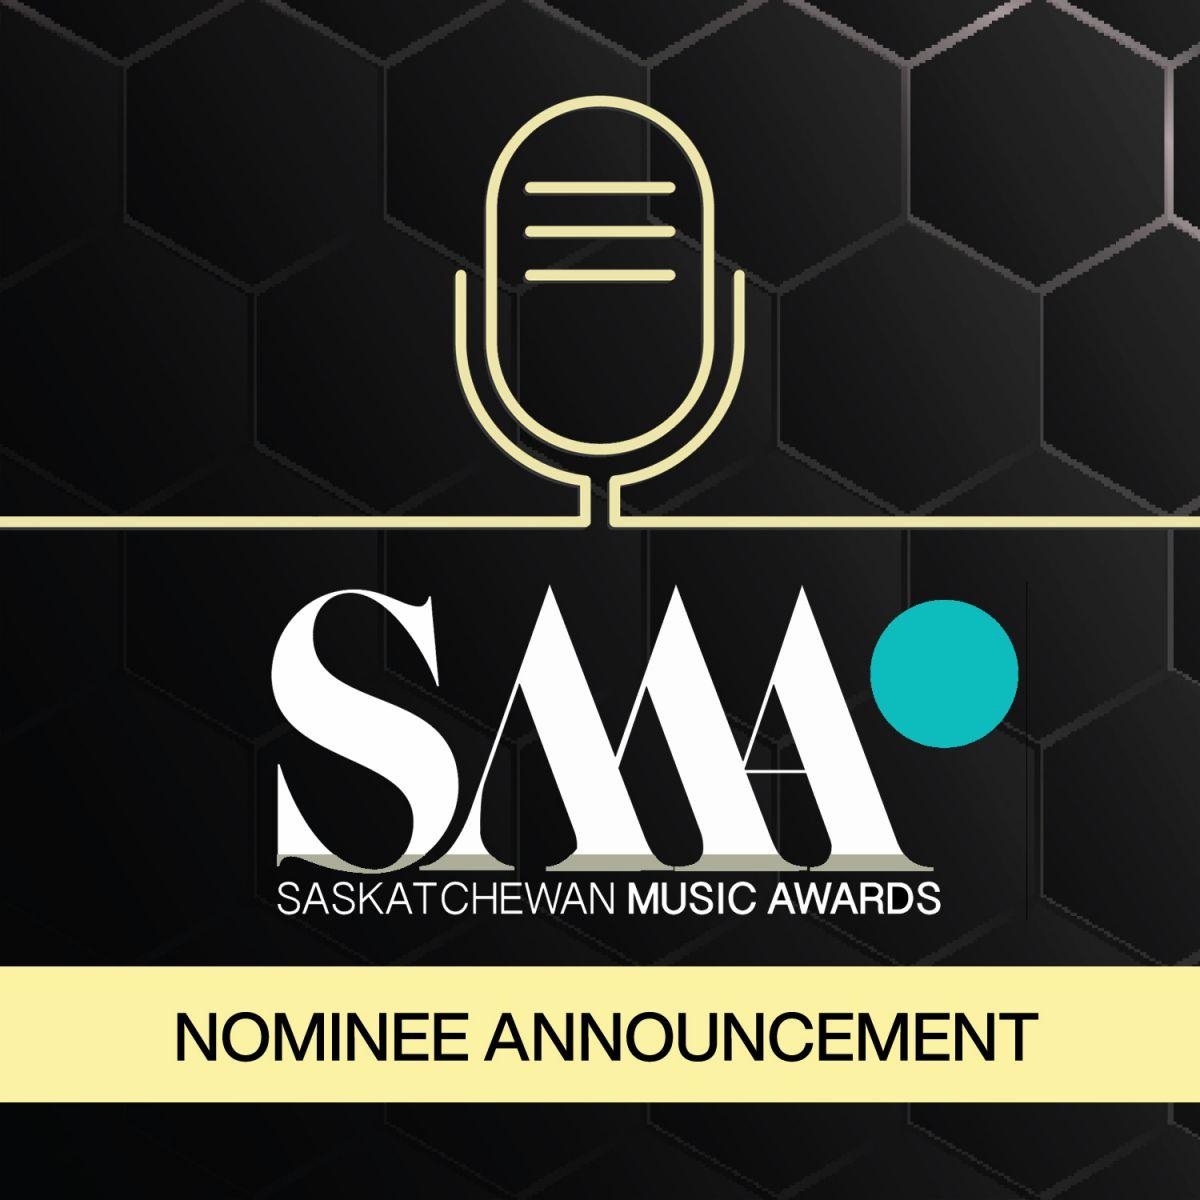 SMA Nominee Announcement